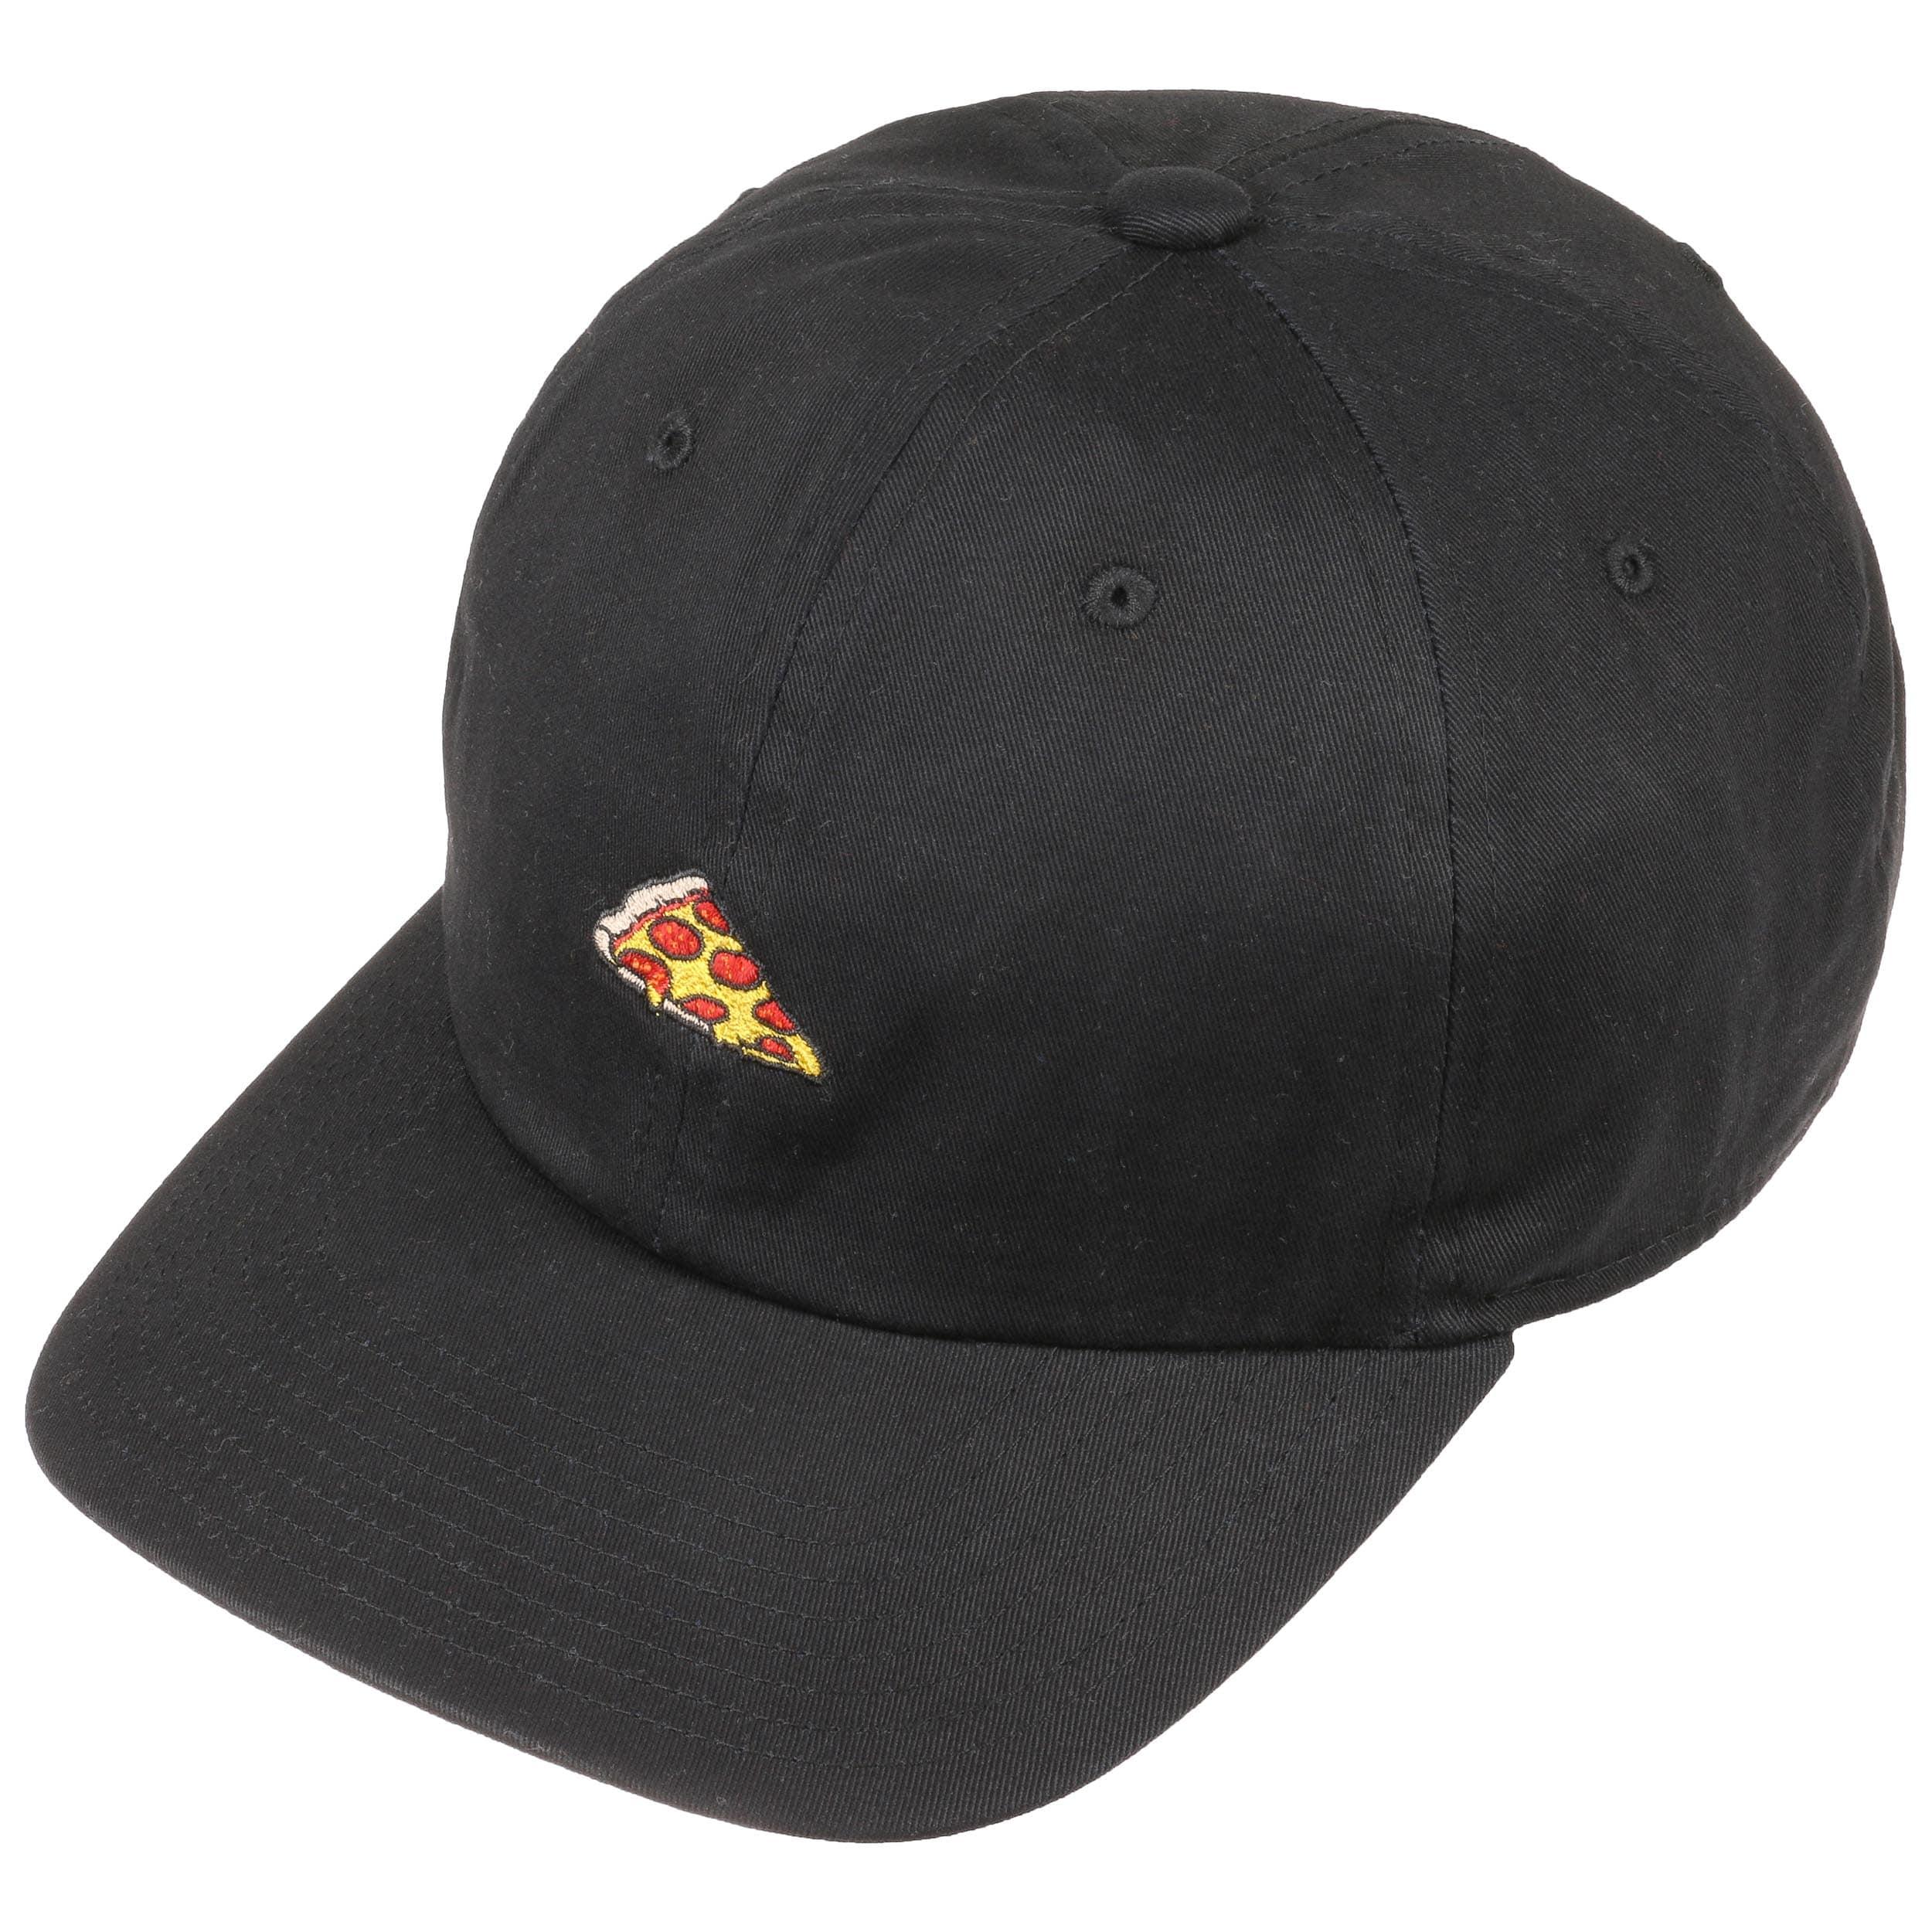 8aee07b9f0f ... The Jones Strapback Cap by Coal - black 1 ...